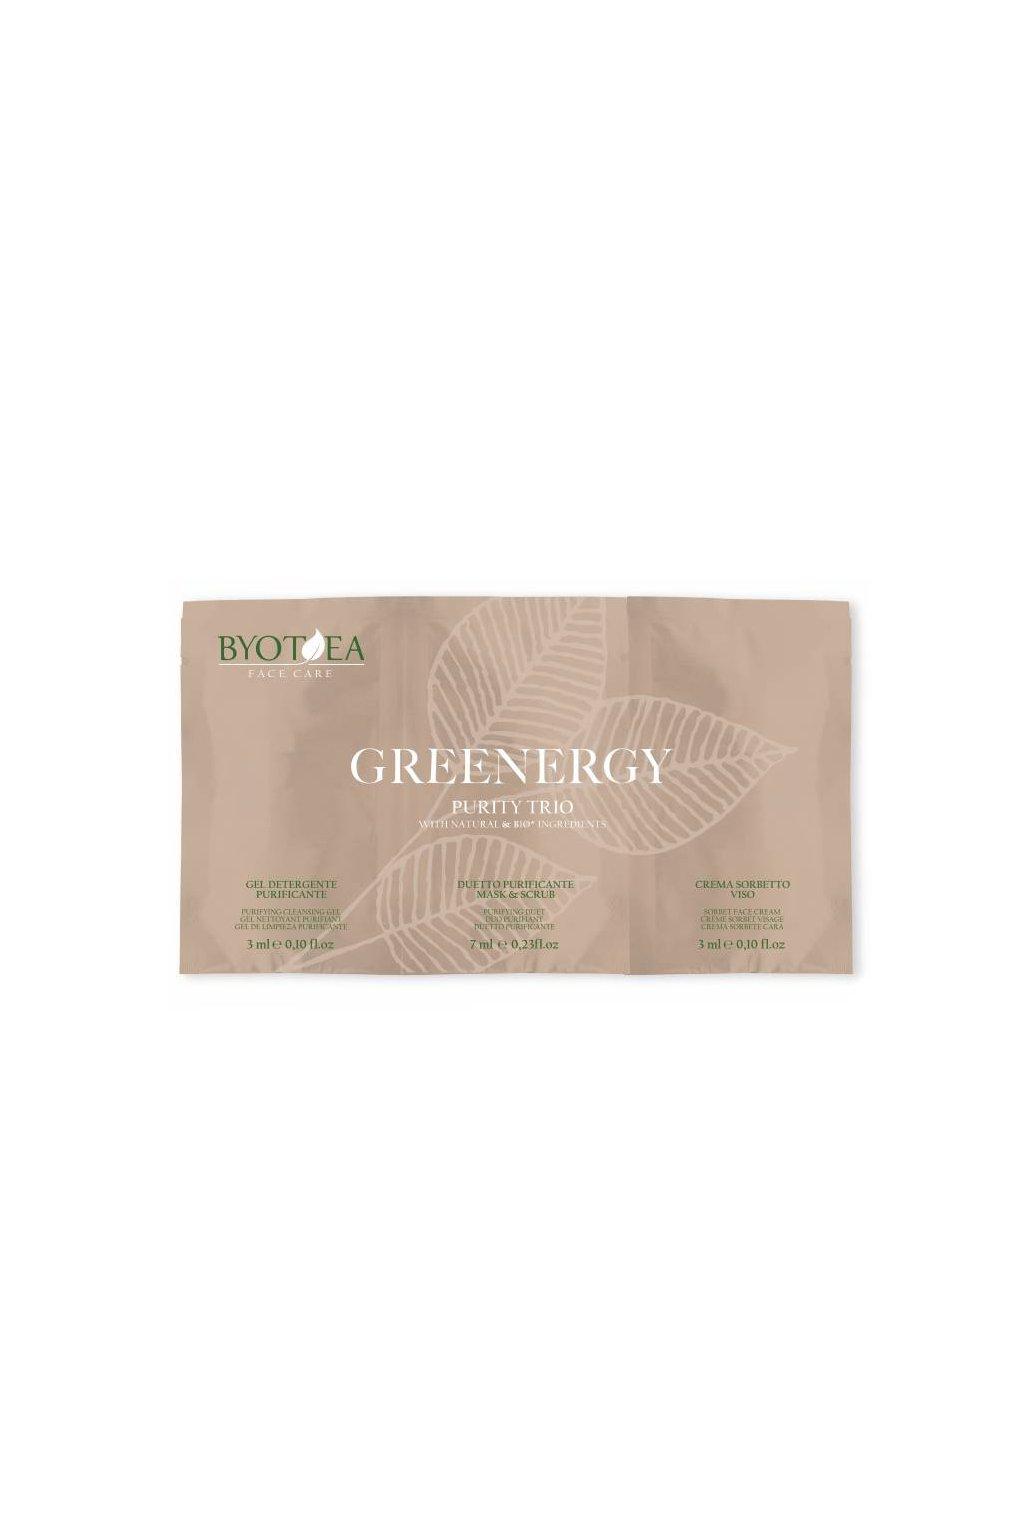 10949 byotea greenergy cistici trio tester set 3v1 cistici gel maska krem sorbet